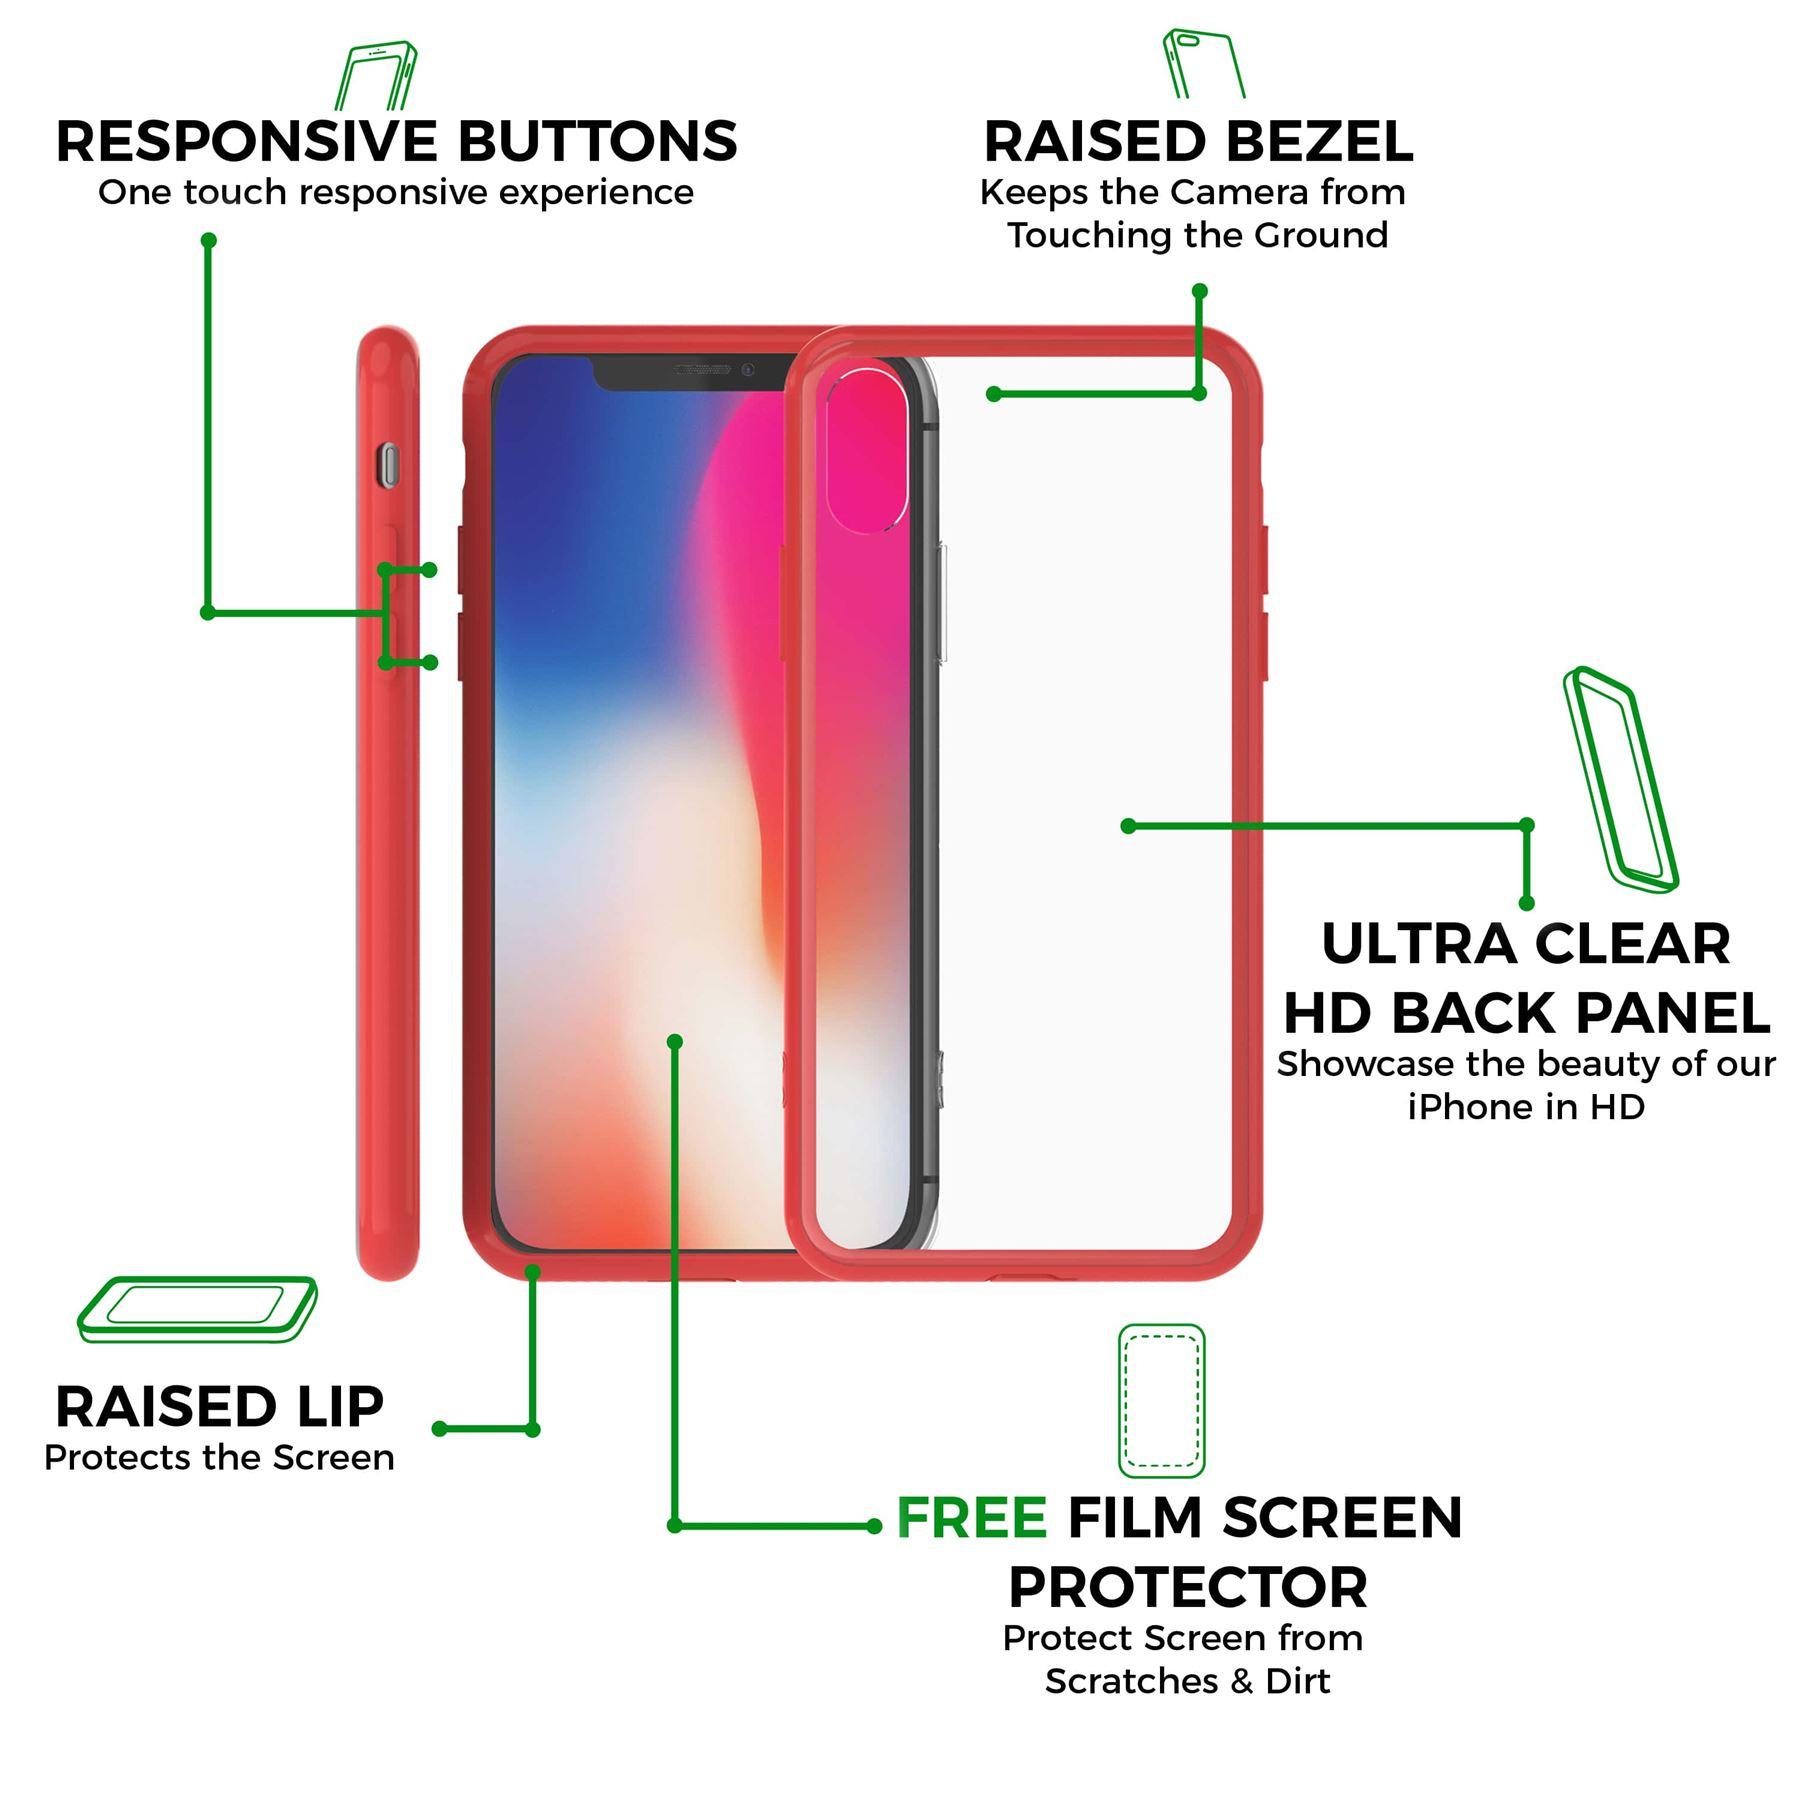 thumbnail 21 - For Apple iPhone XR Xs Max X 8 7 Plus 6 5 Se Case Cover Clear Transparent CS283